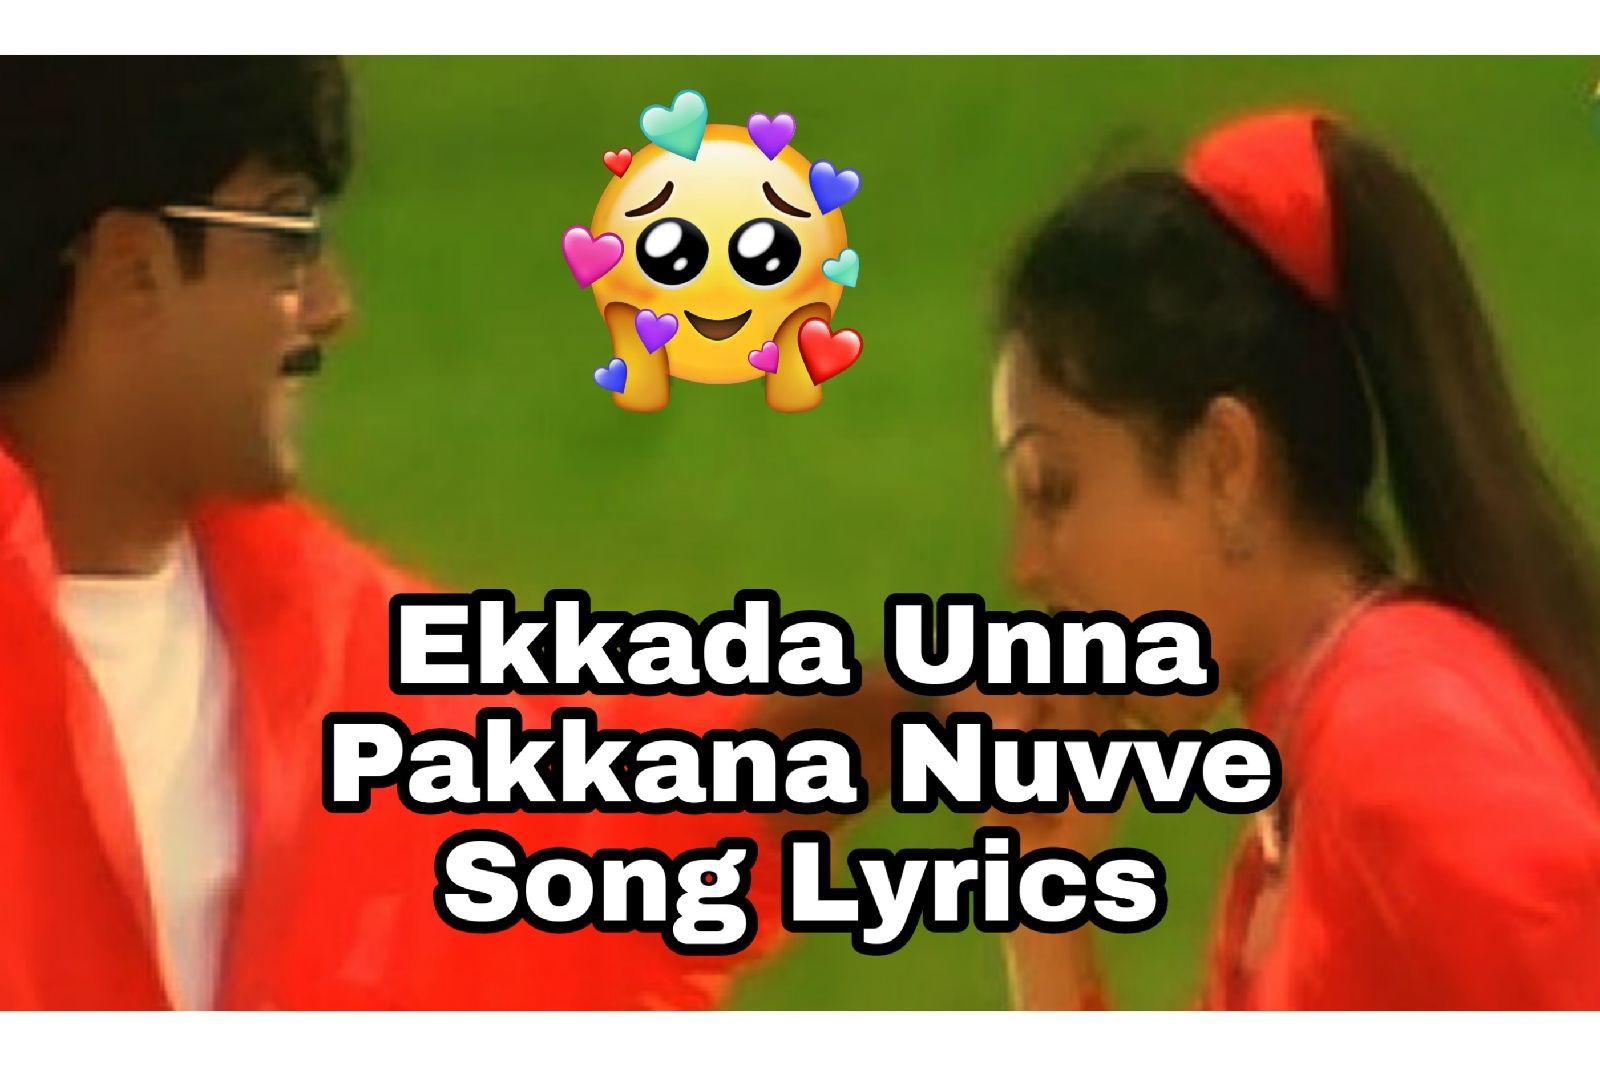 Ekkada Unna Pakkana Nuvve Song Lyrics In 2020 Song Lyrics Lyrics Singer